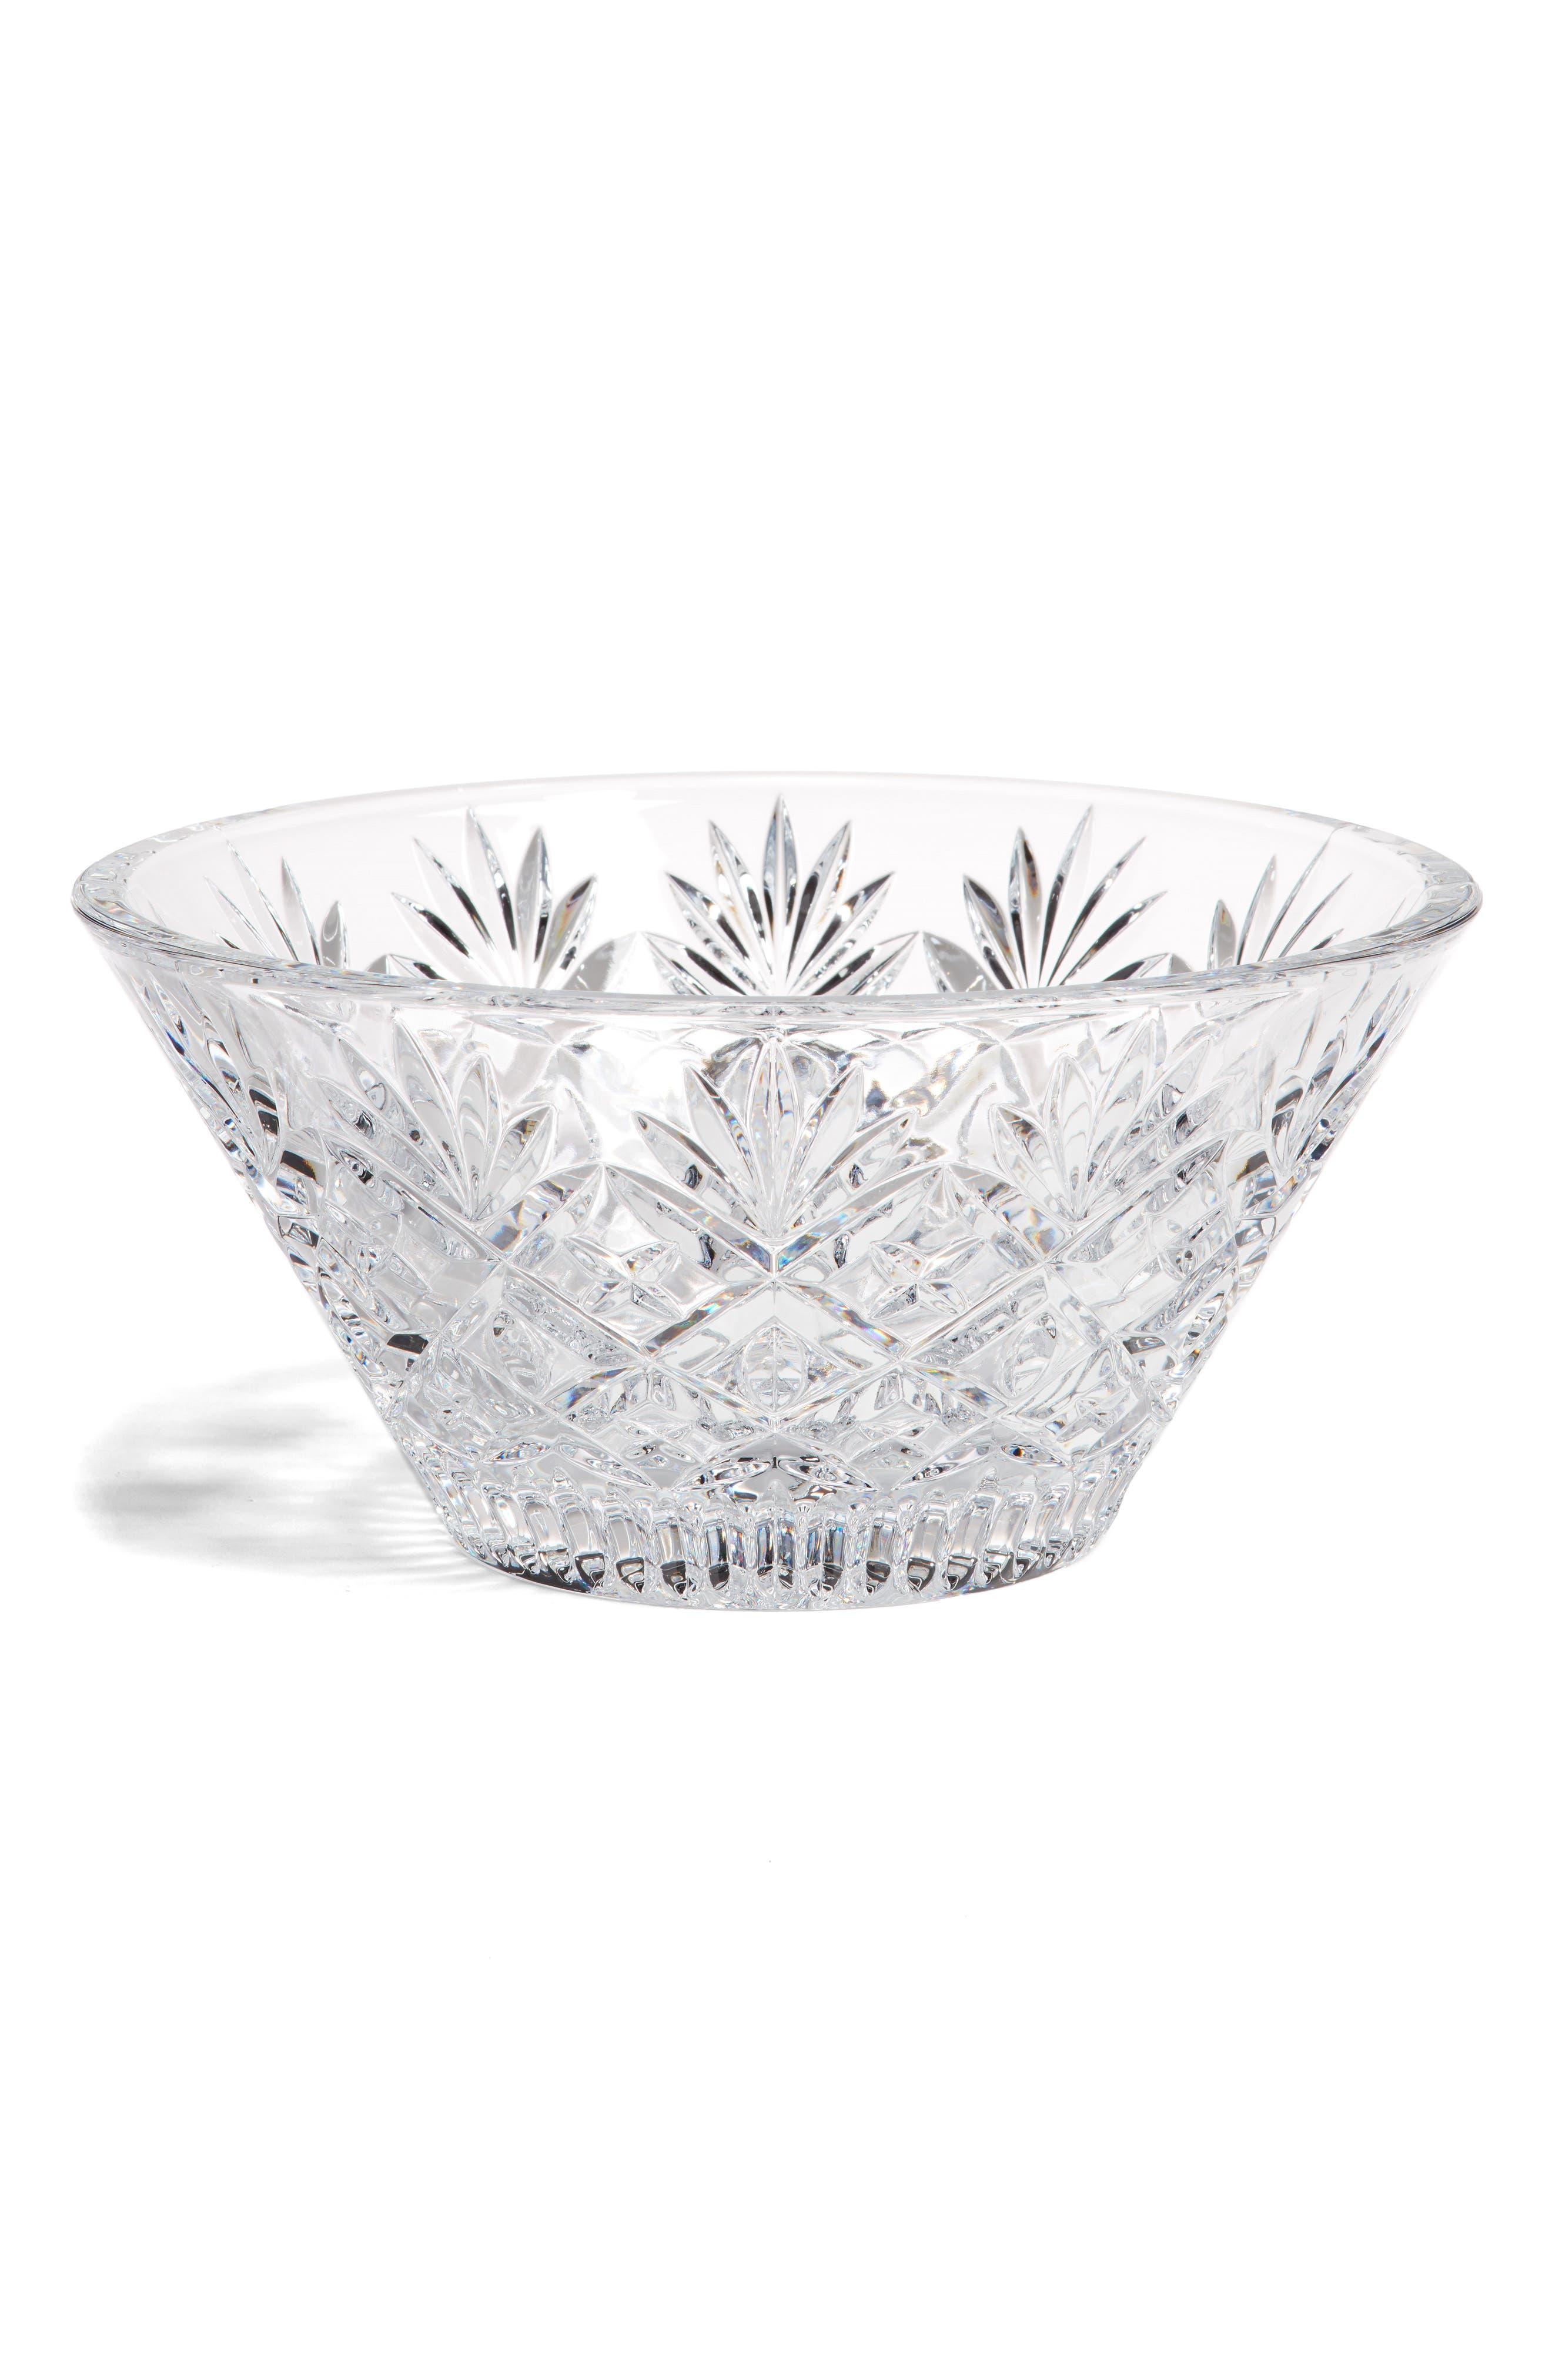 Main Image - Waterford Northbridge Lead Crystal Bowl